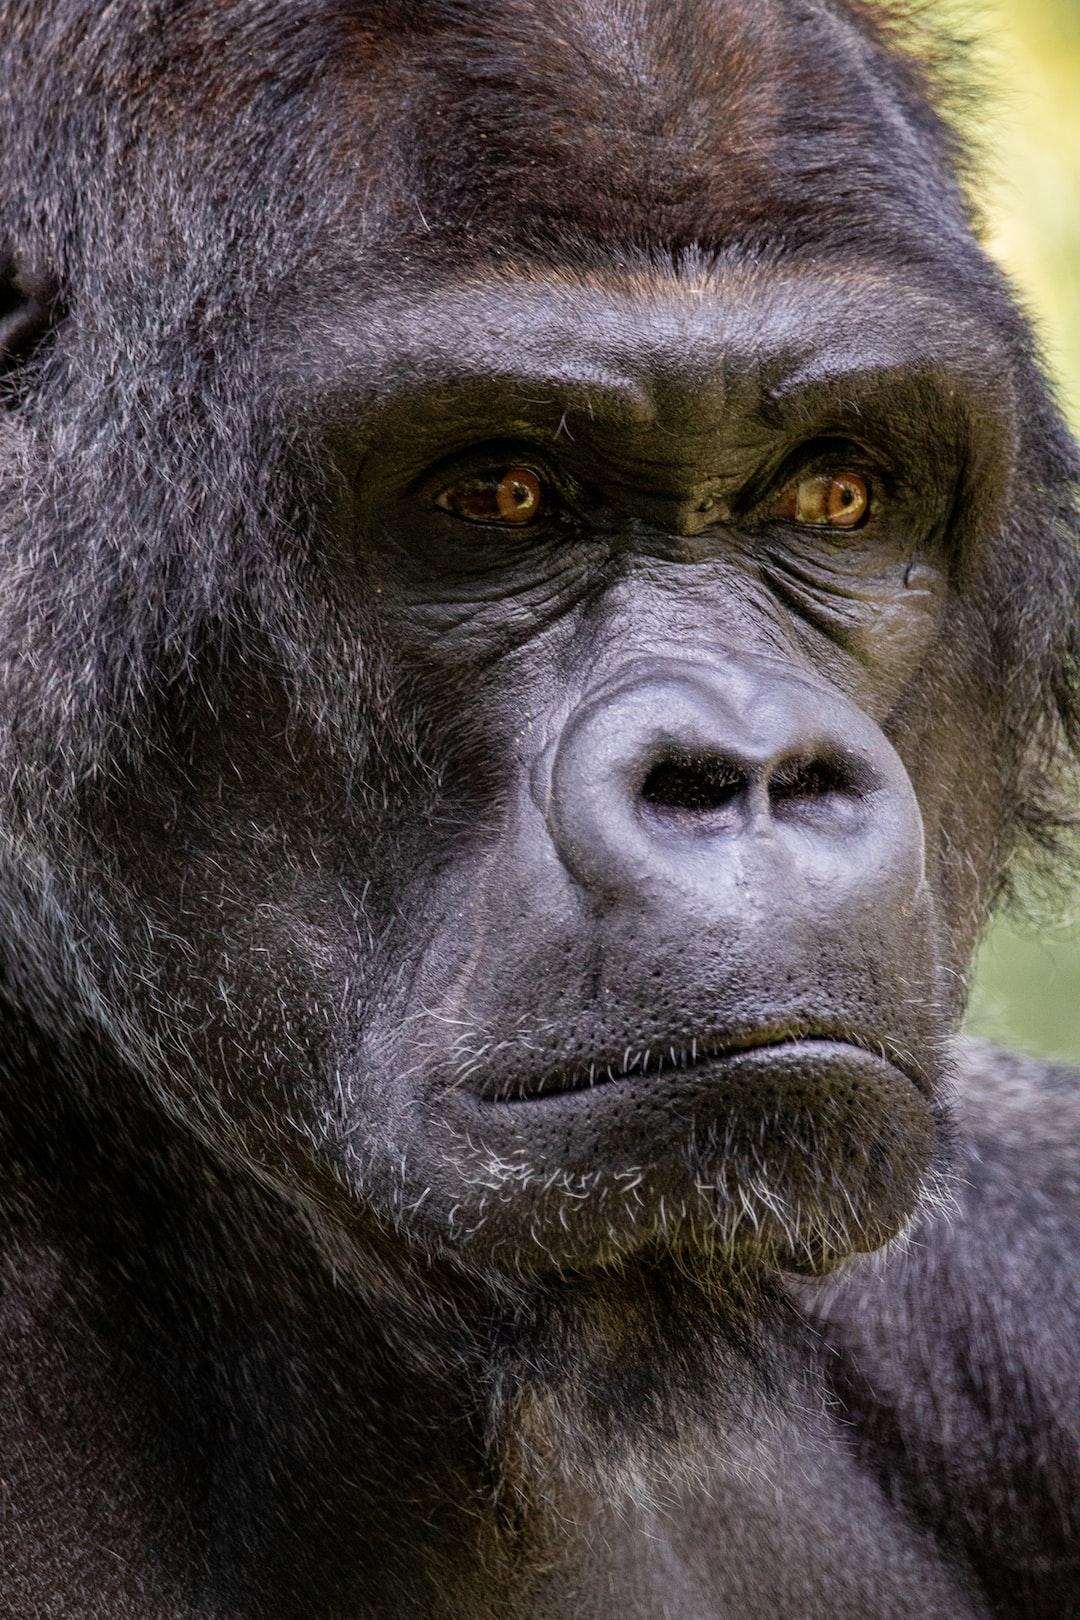 Portrait of a silverback gorilla at the Memphis Zoo.